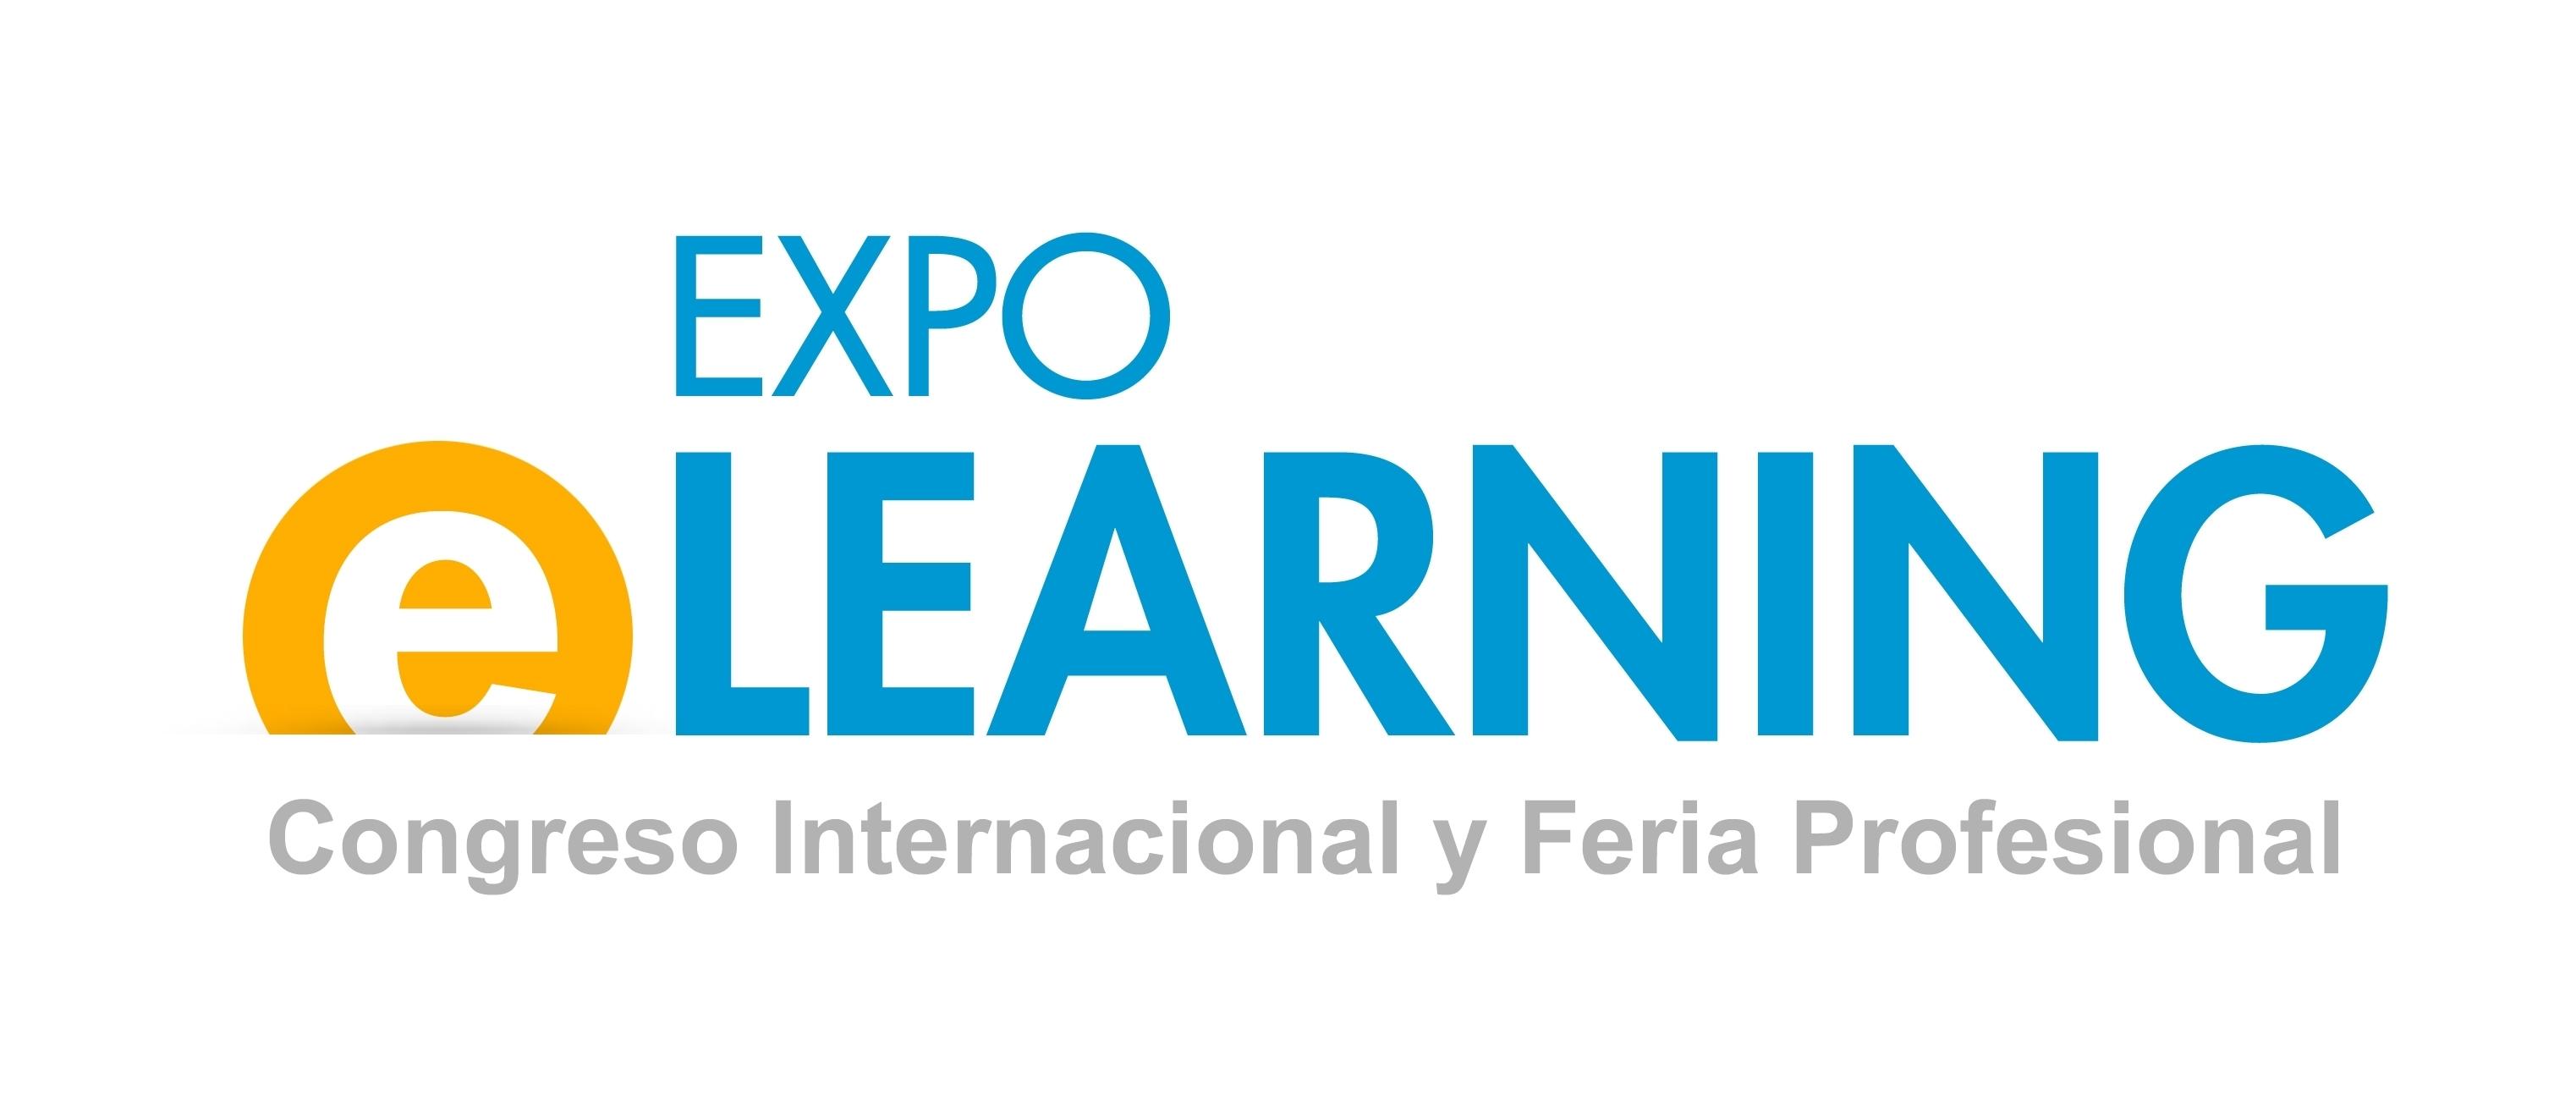 EXPOELEARNING MADRID 2014: El socialearning llega a las empresas | Noticias Iberestudios